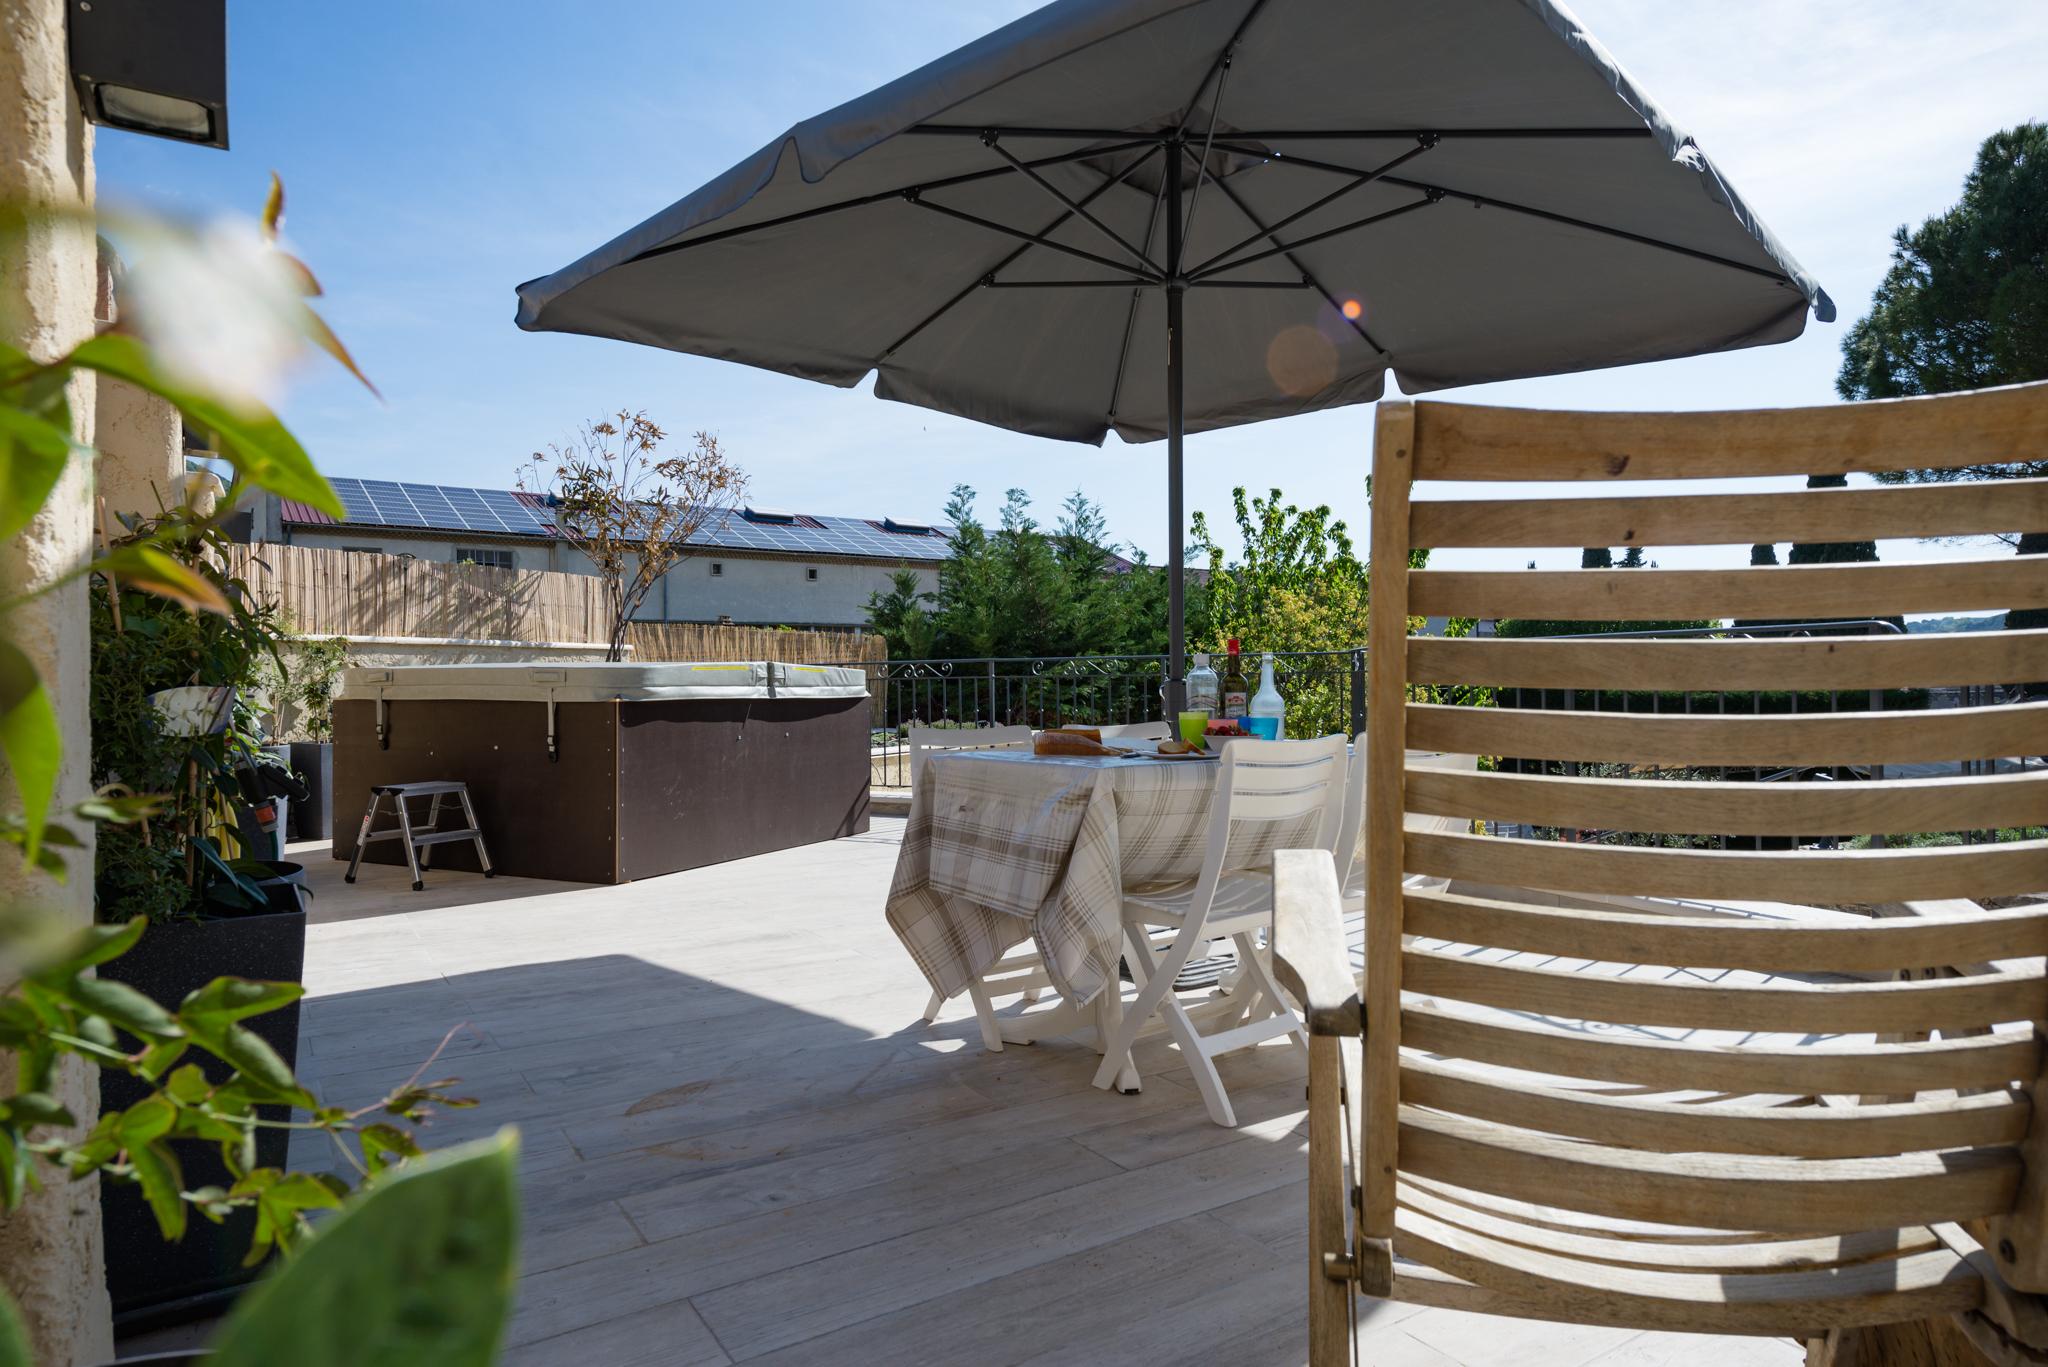 ferienhaus-Nyons-pool-DSC_4622.jpg